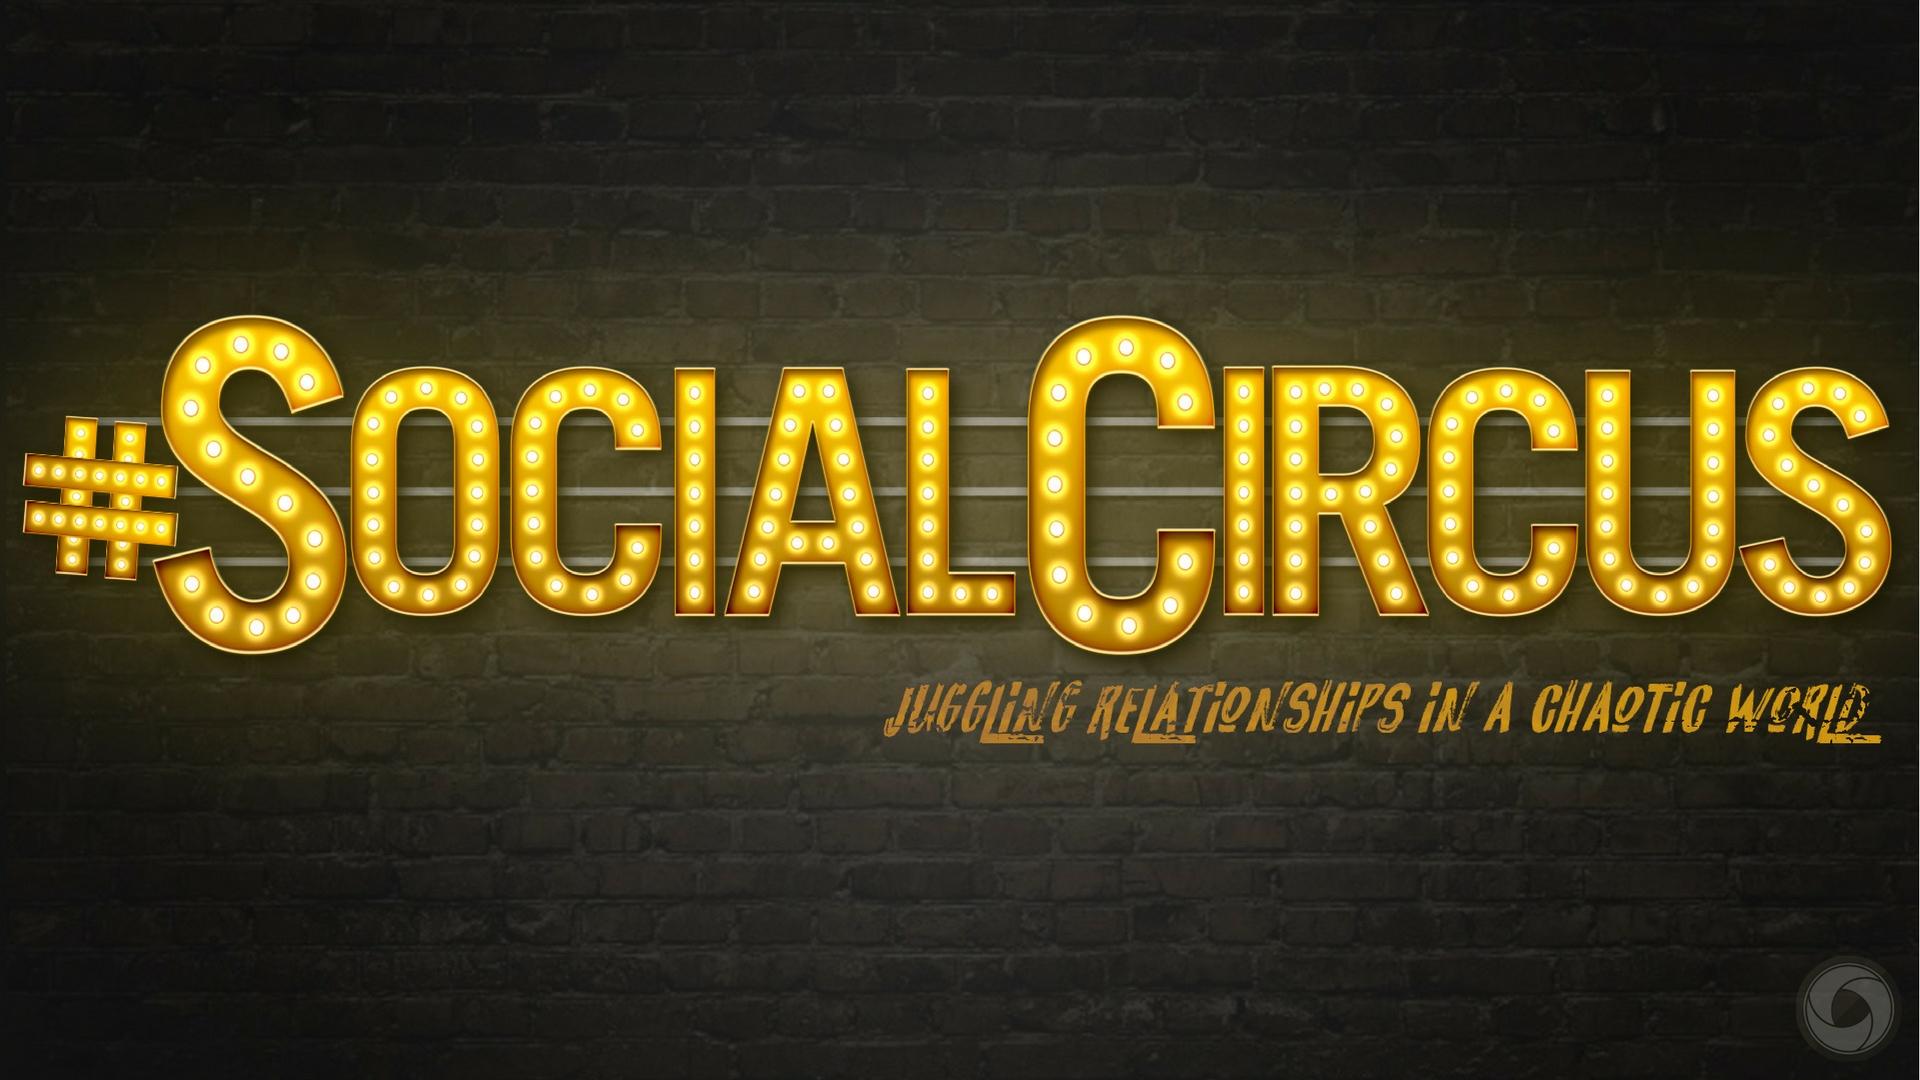 #SocialCircus -